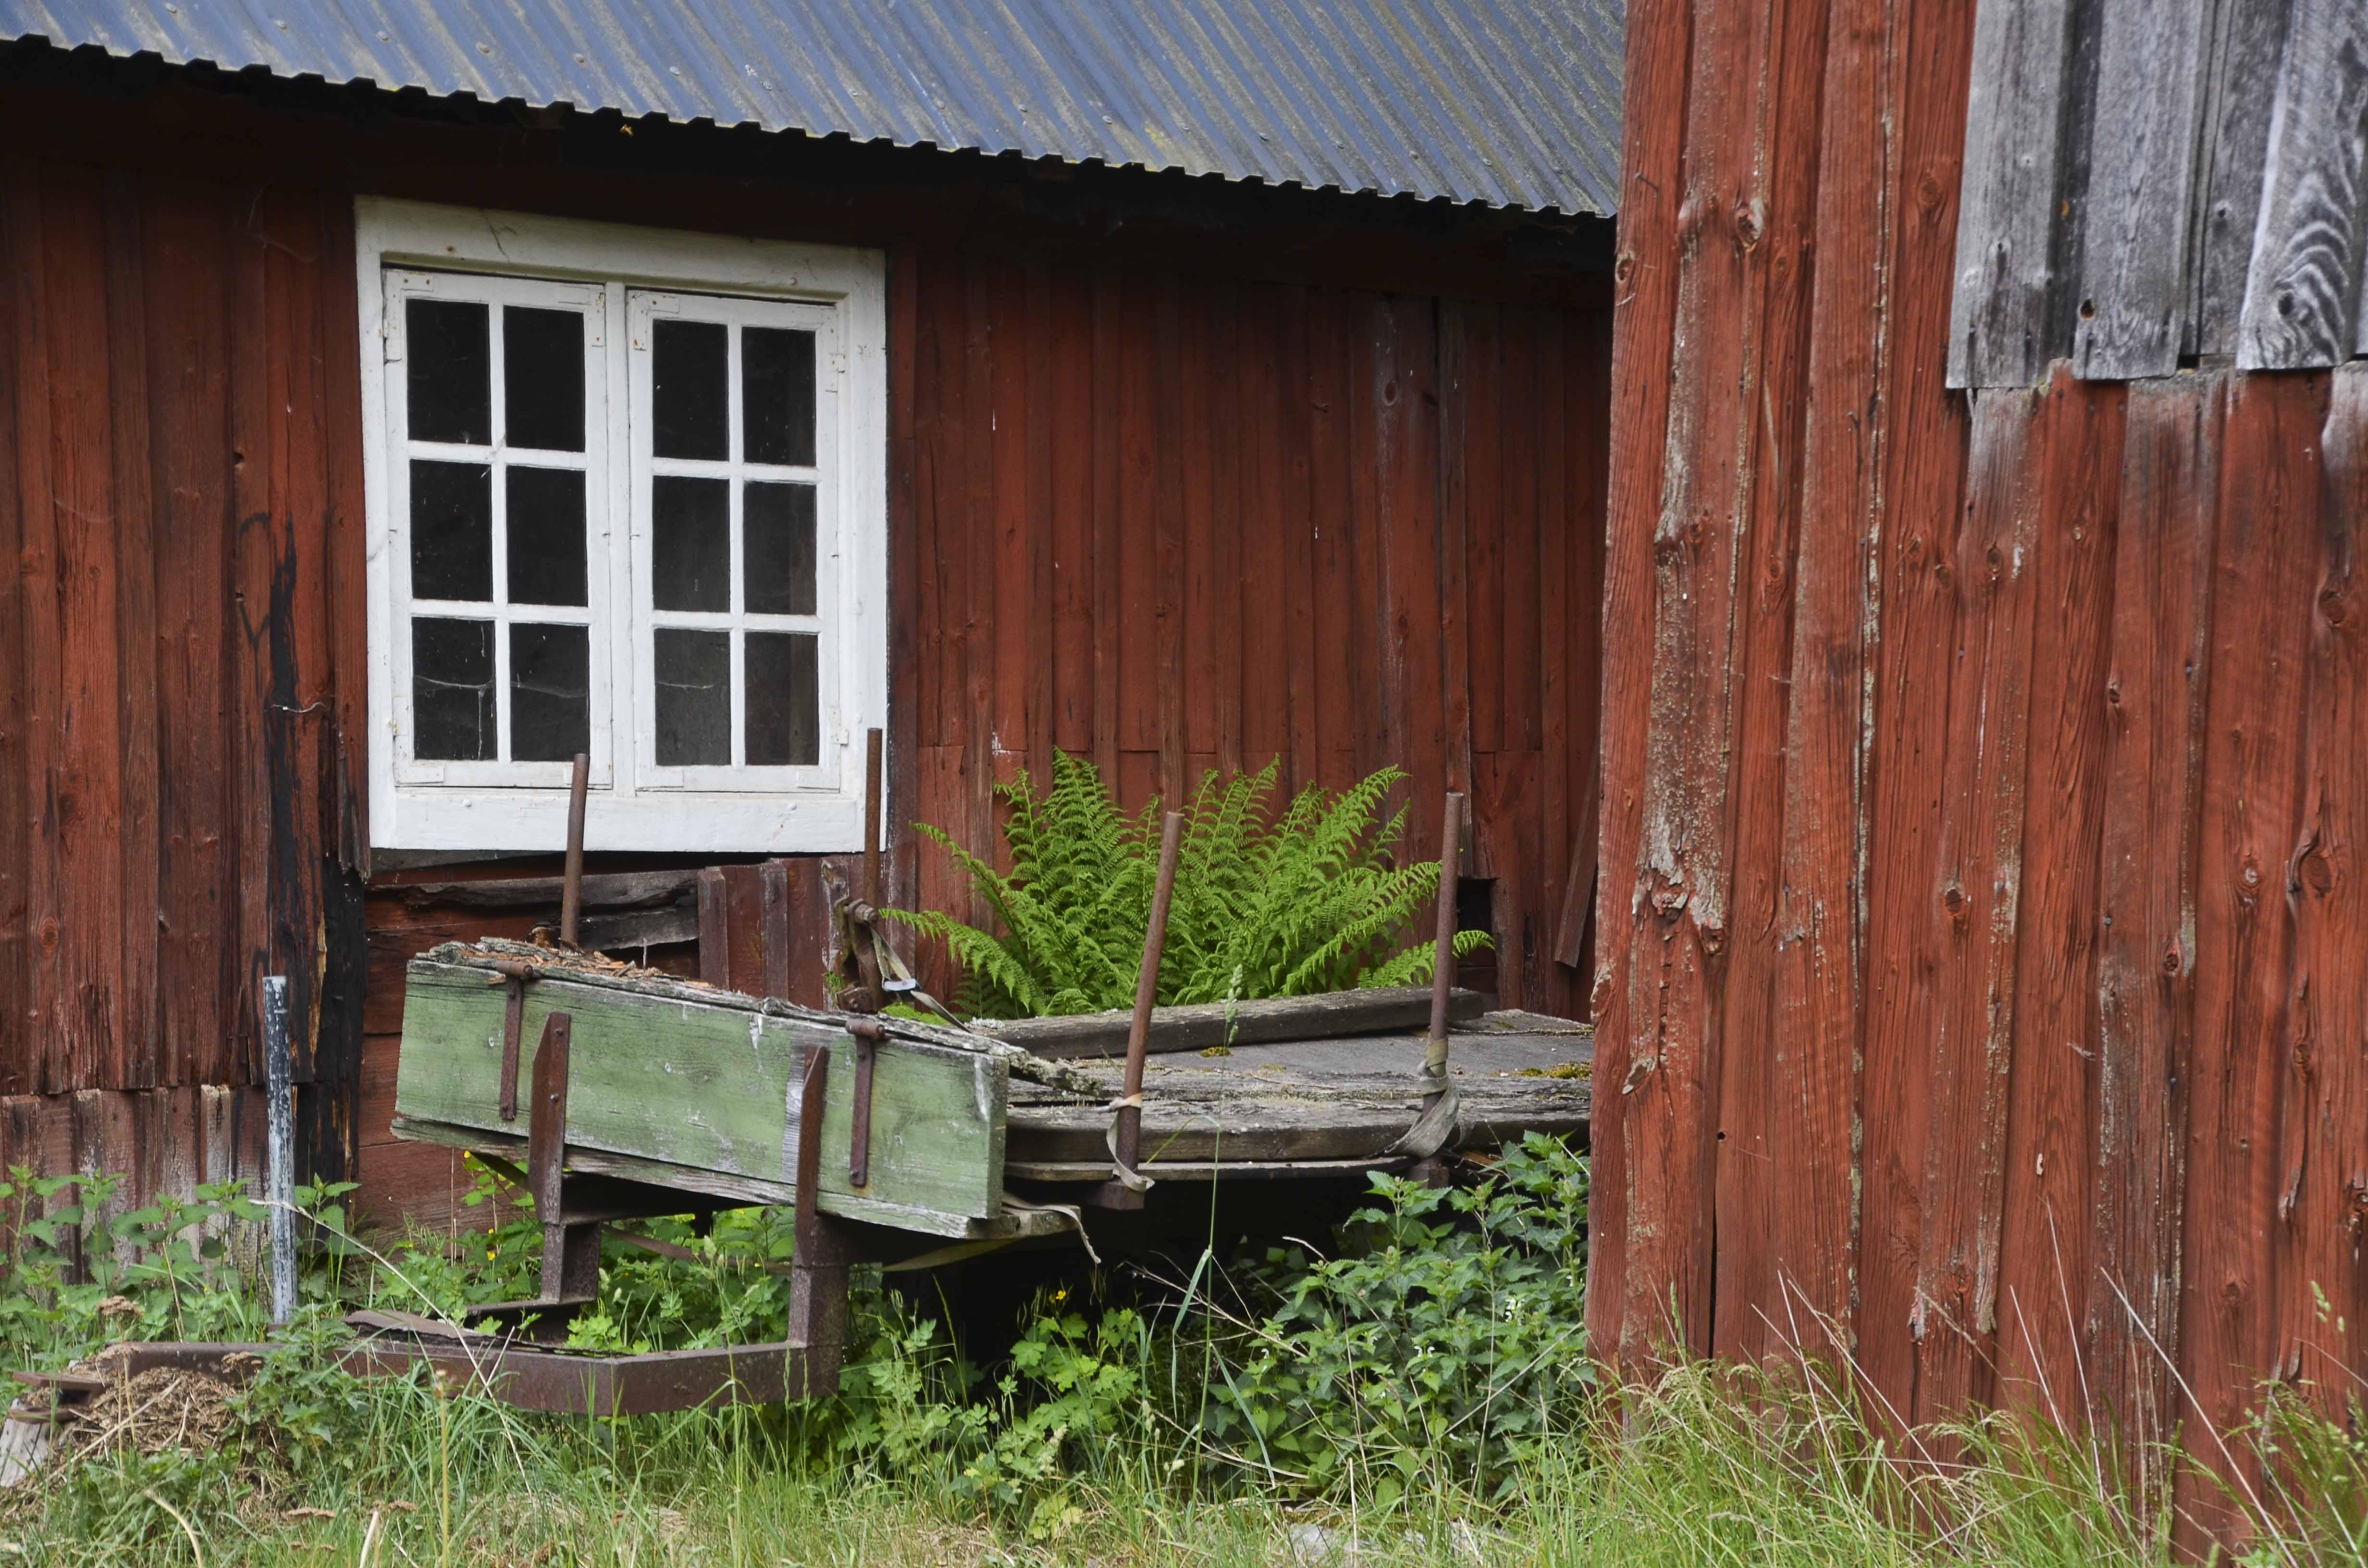 Torsebro Krutbruk